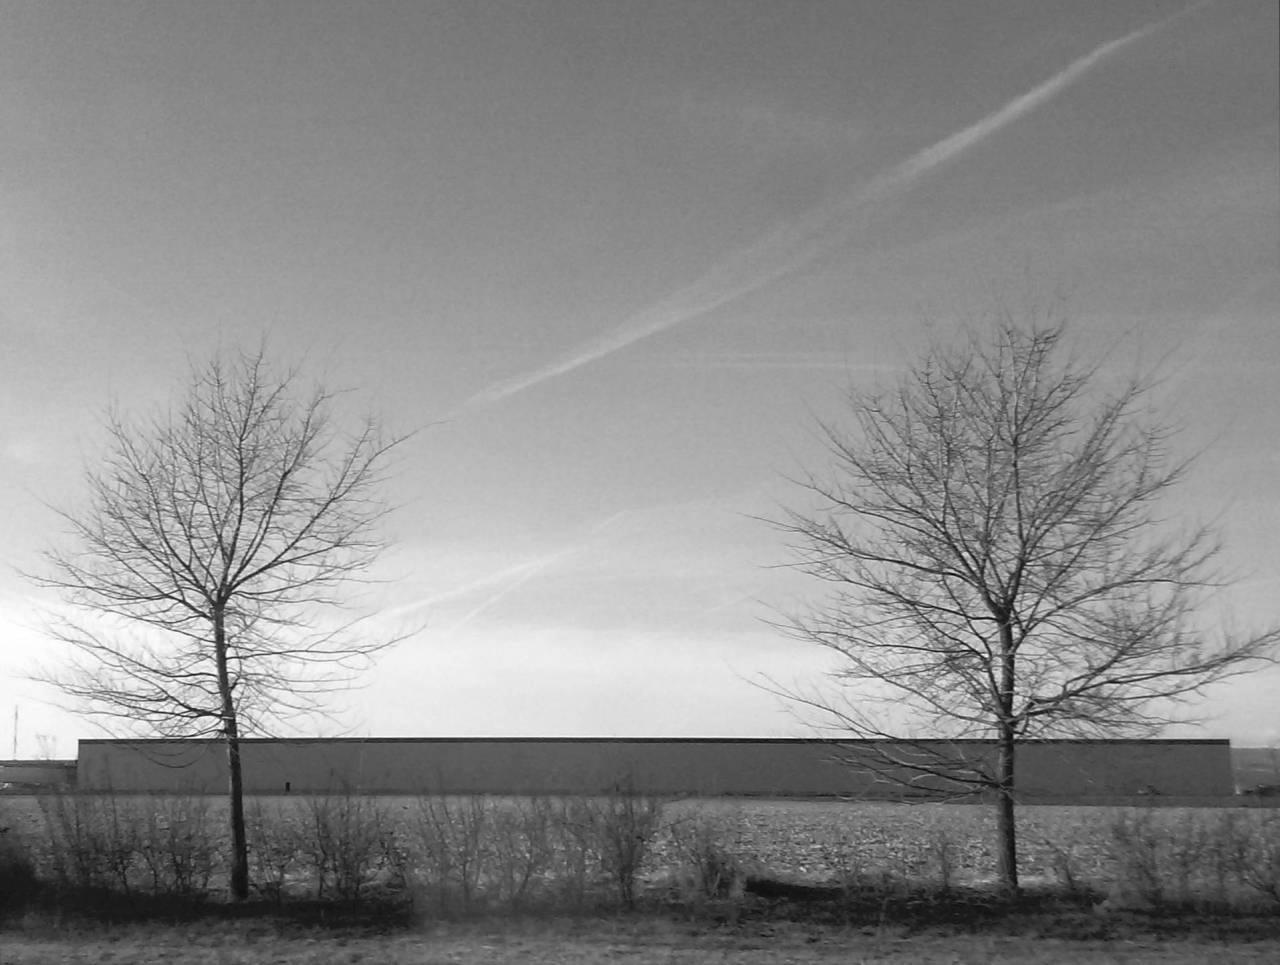 365/239 - Út menti fák